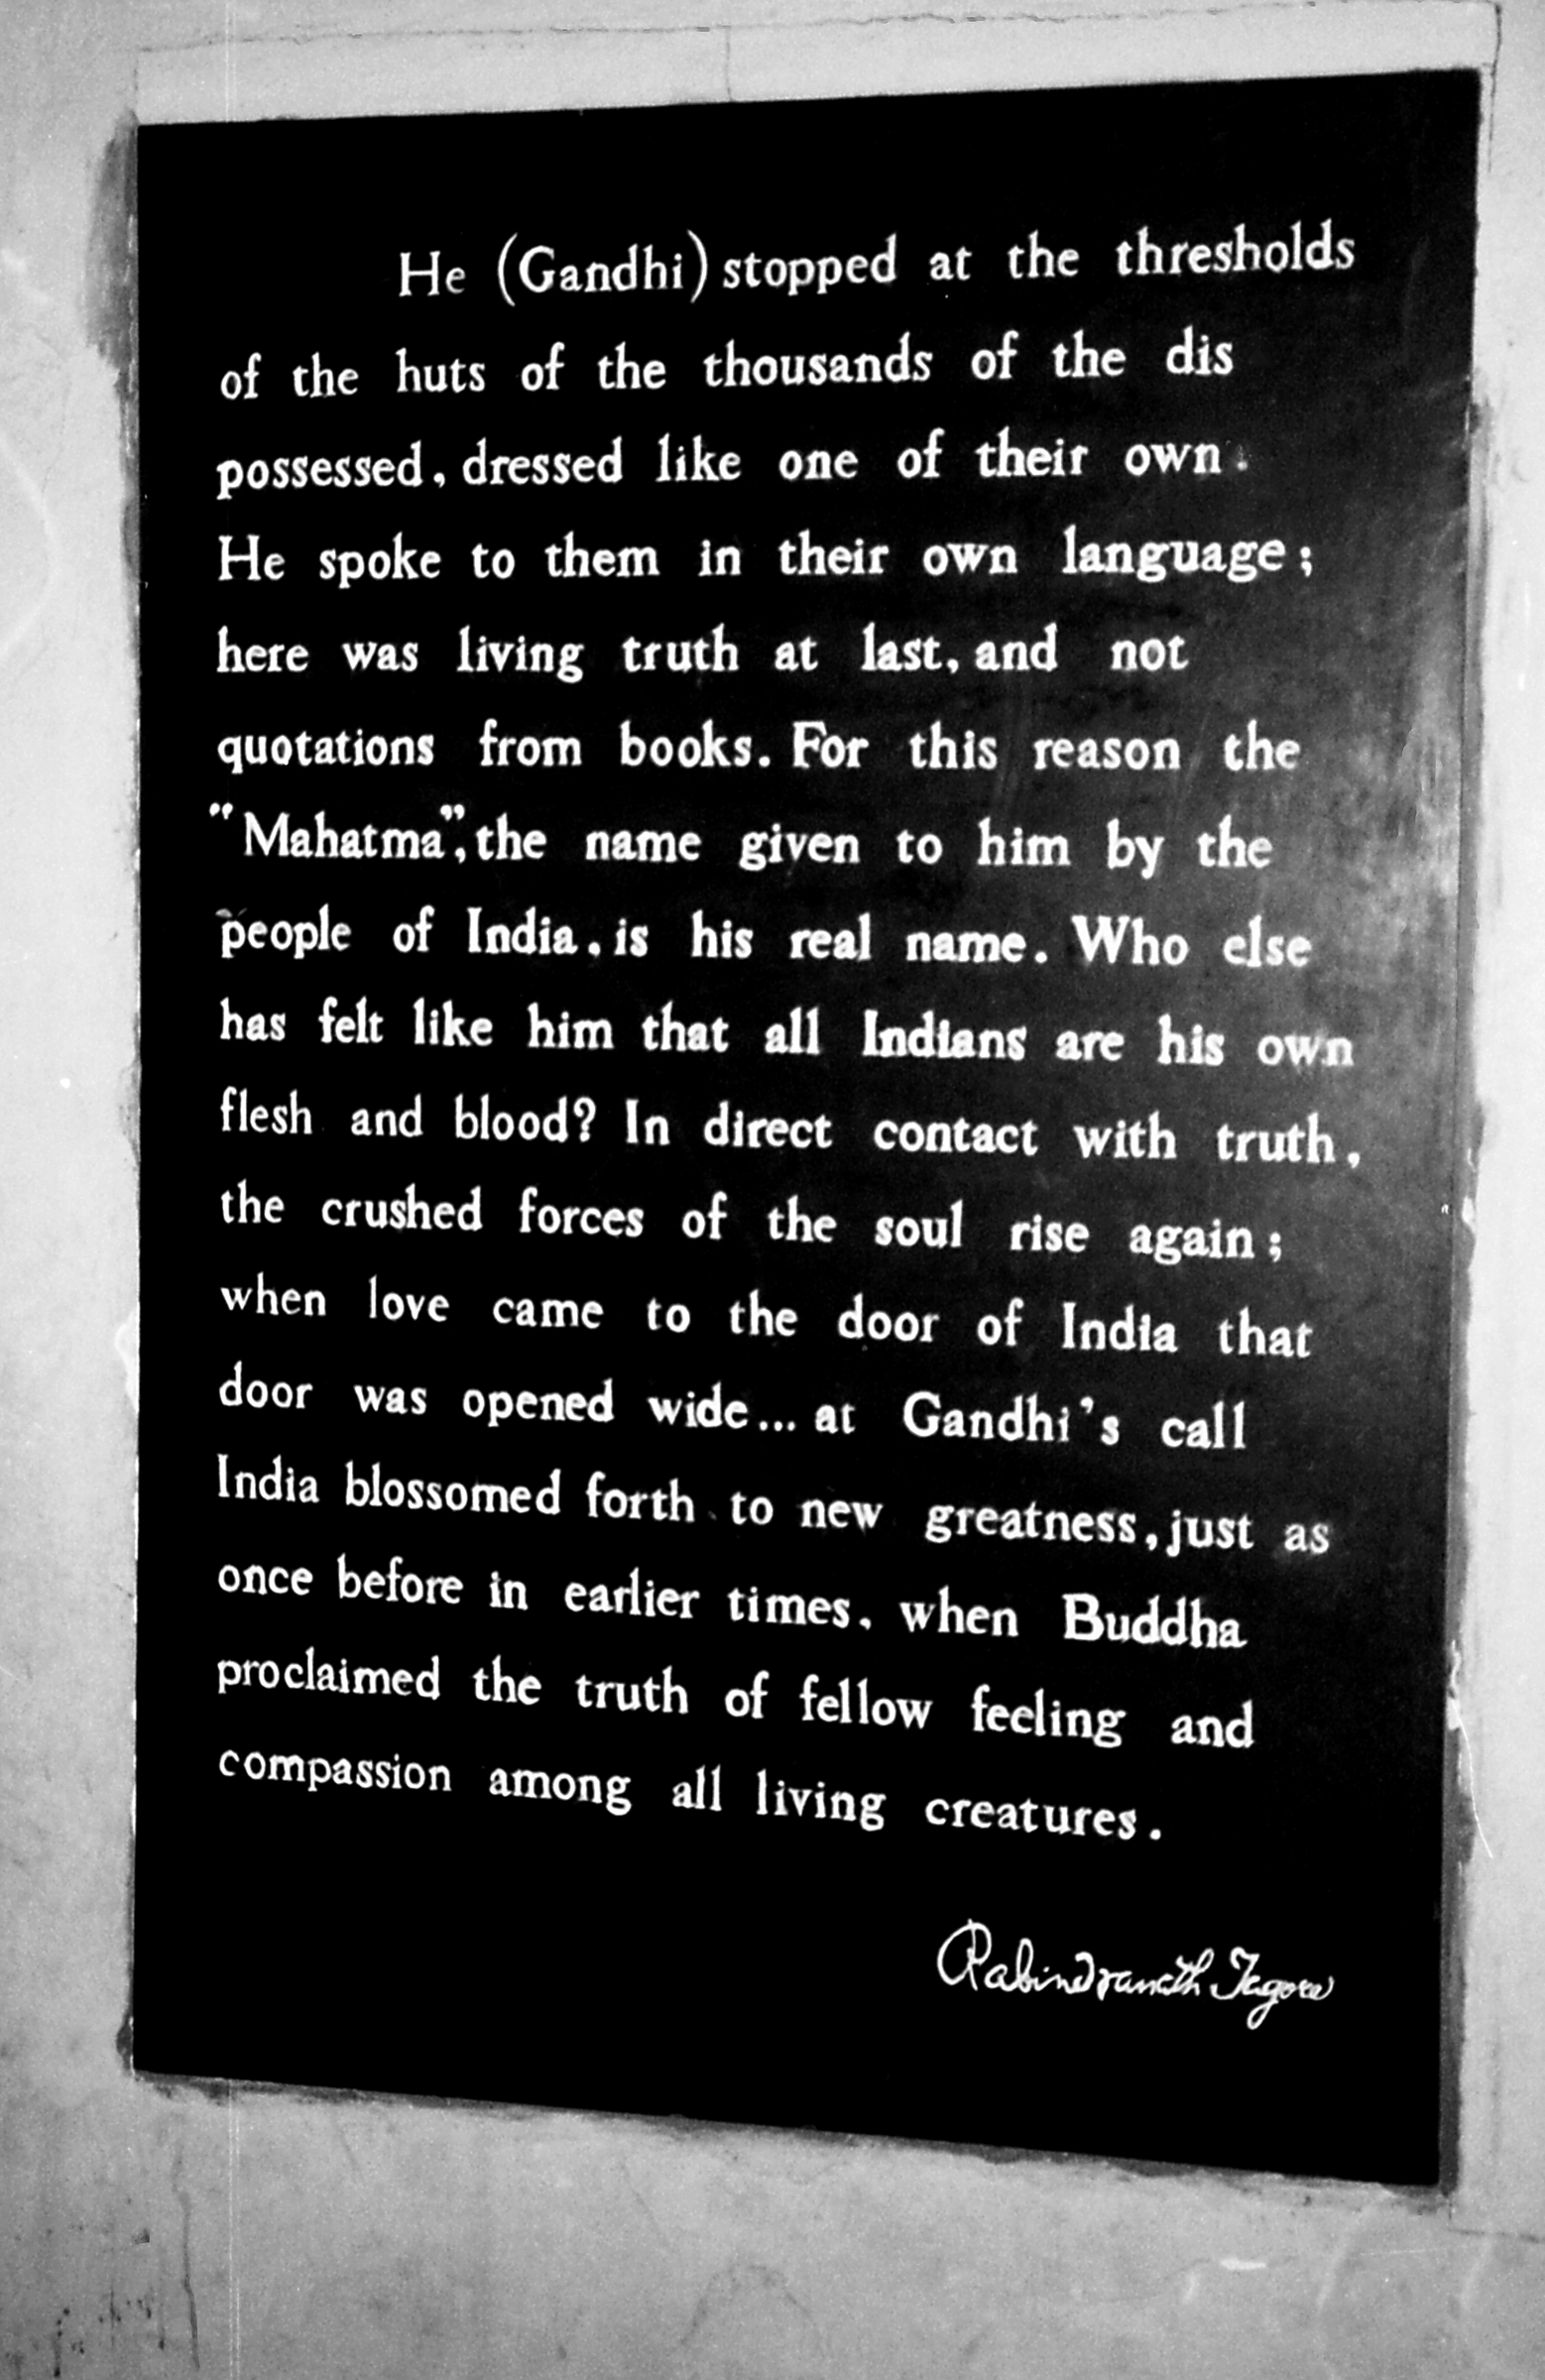 taken @ the Gandhi museum in Madurai, Tamil Na...